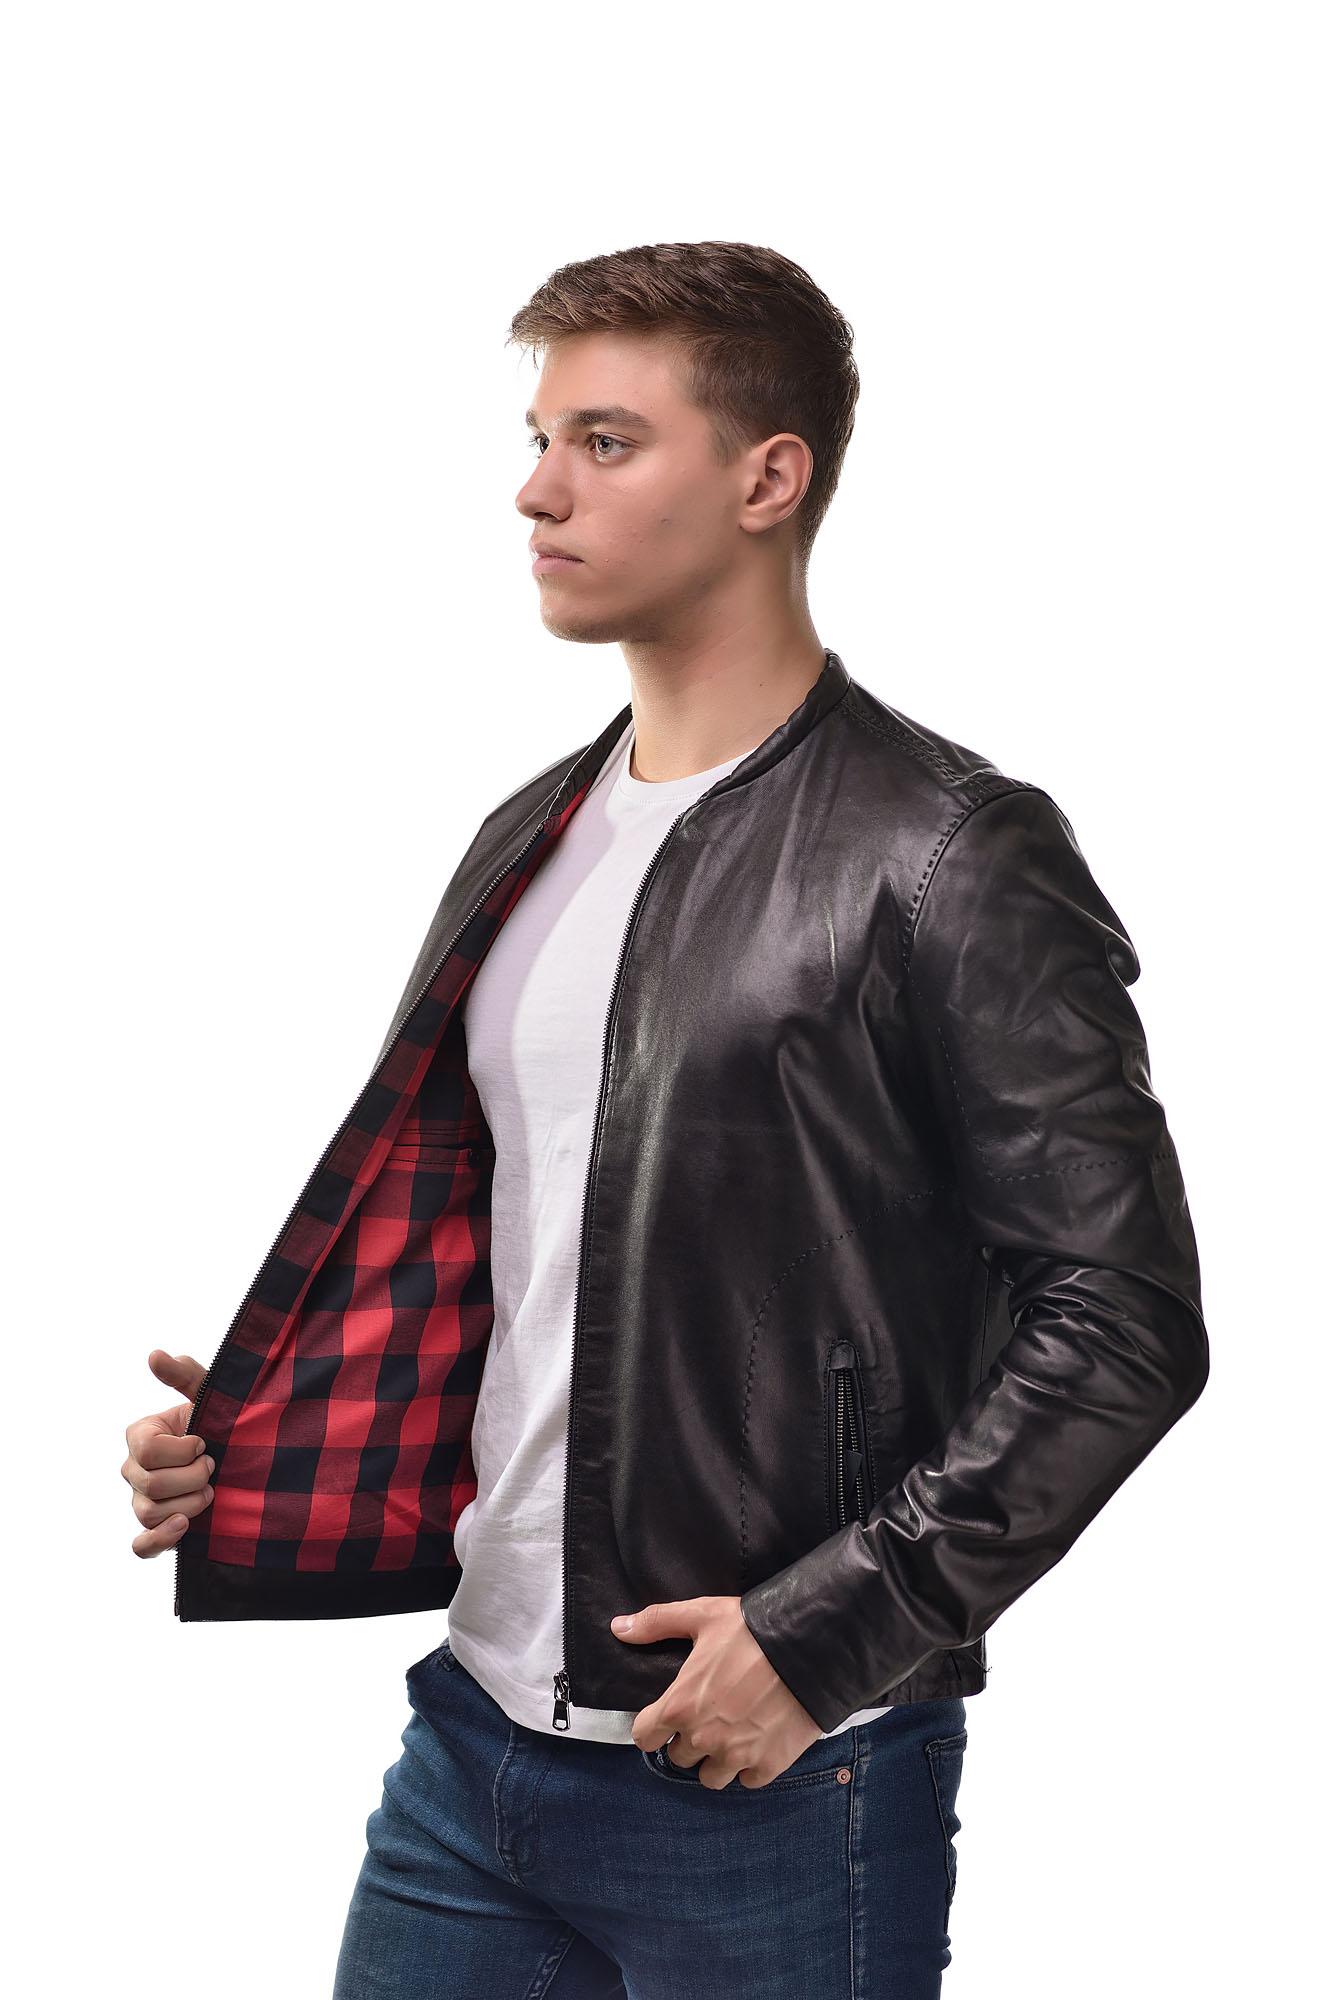 Мужская Кожаная куртка — бомбер2804